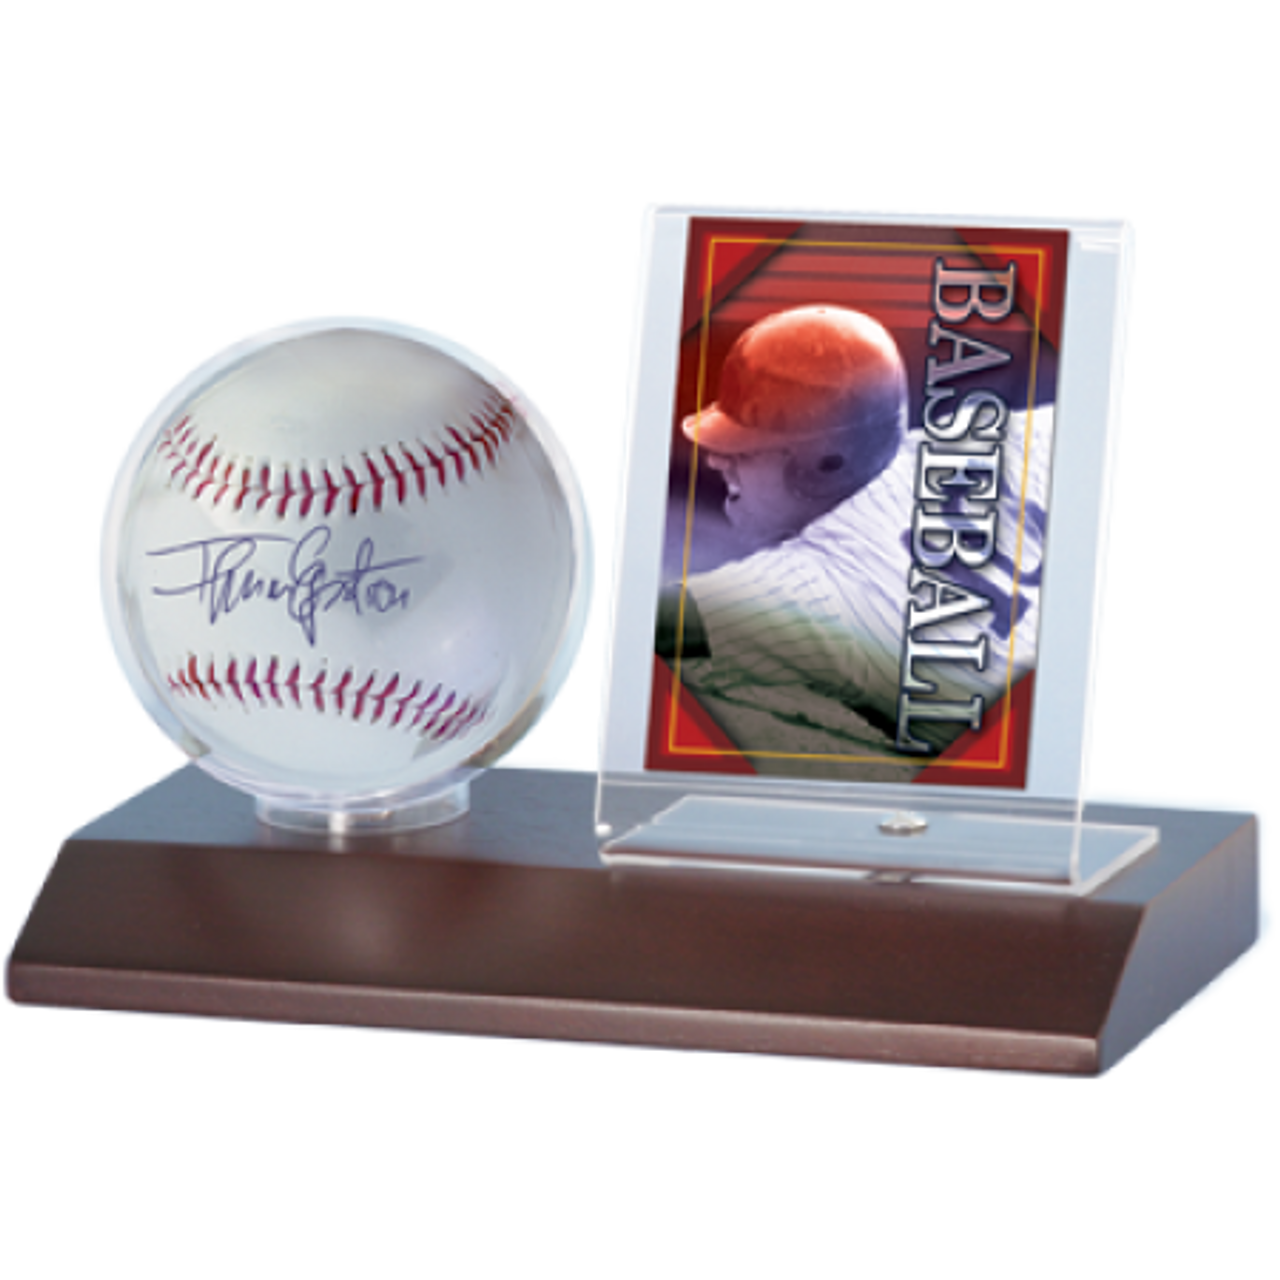 Wood Baseball & Card Holder - Dark Wood